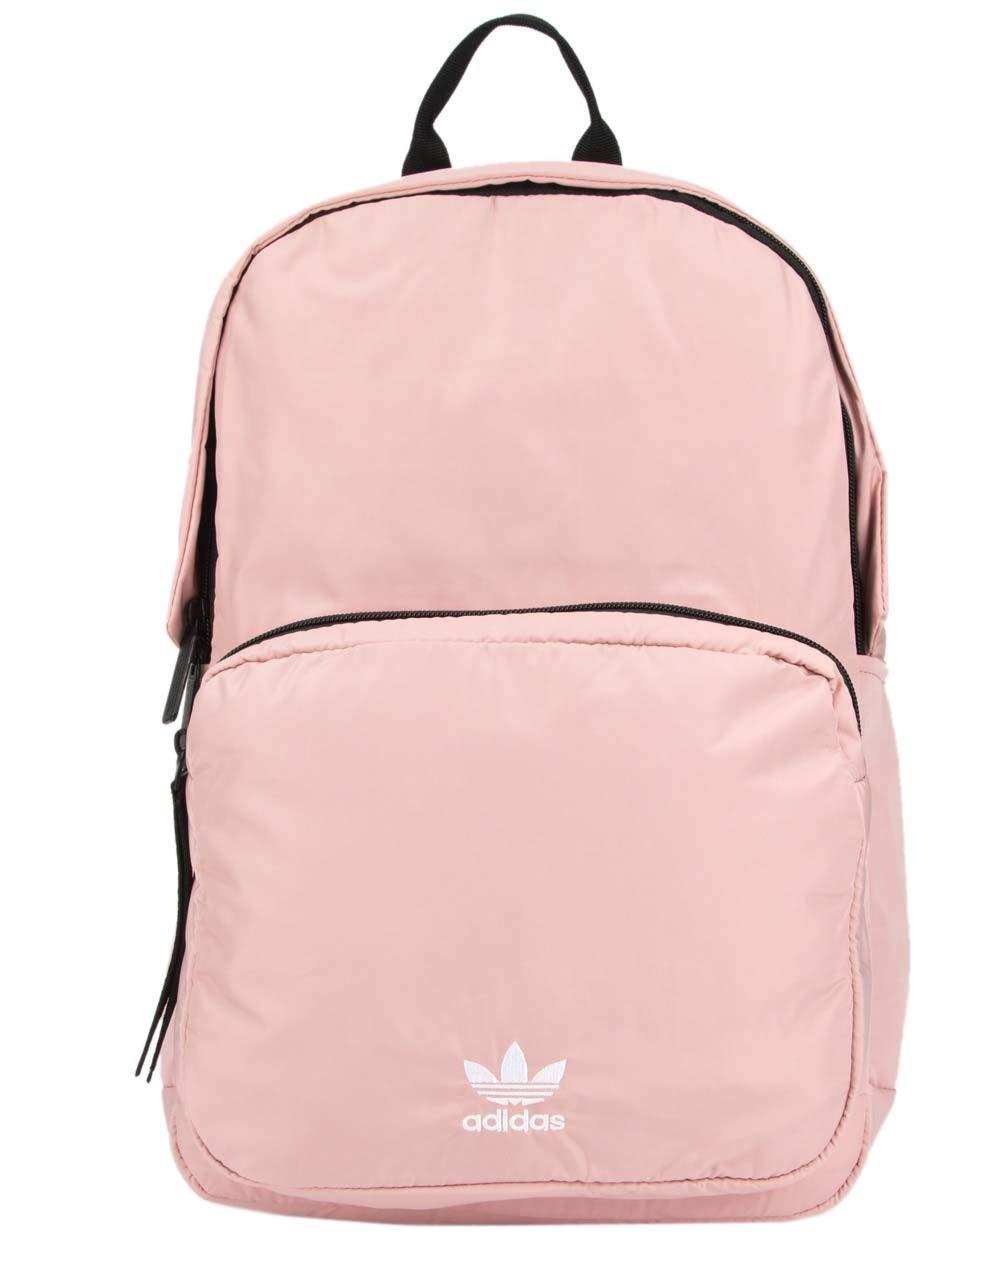 ADIDAS Originals Forum Pink Backpack, Pink by adidas